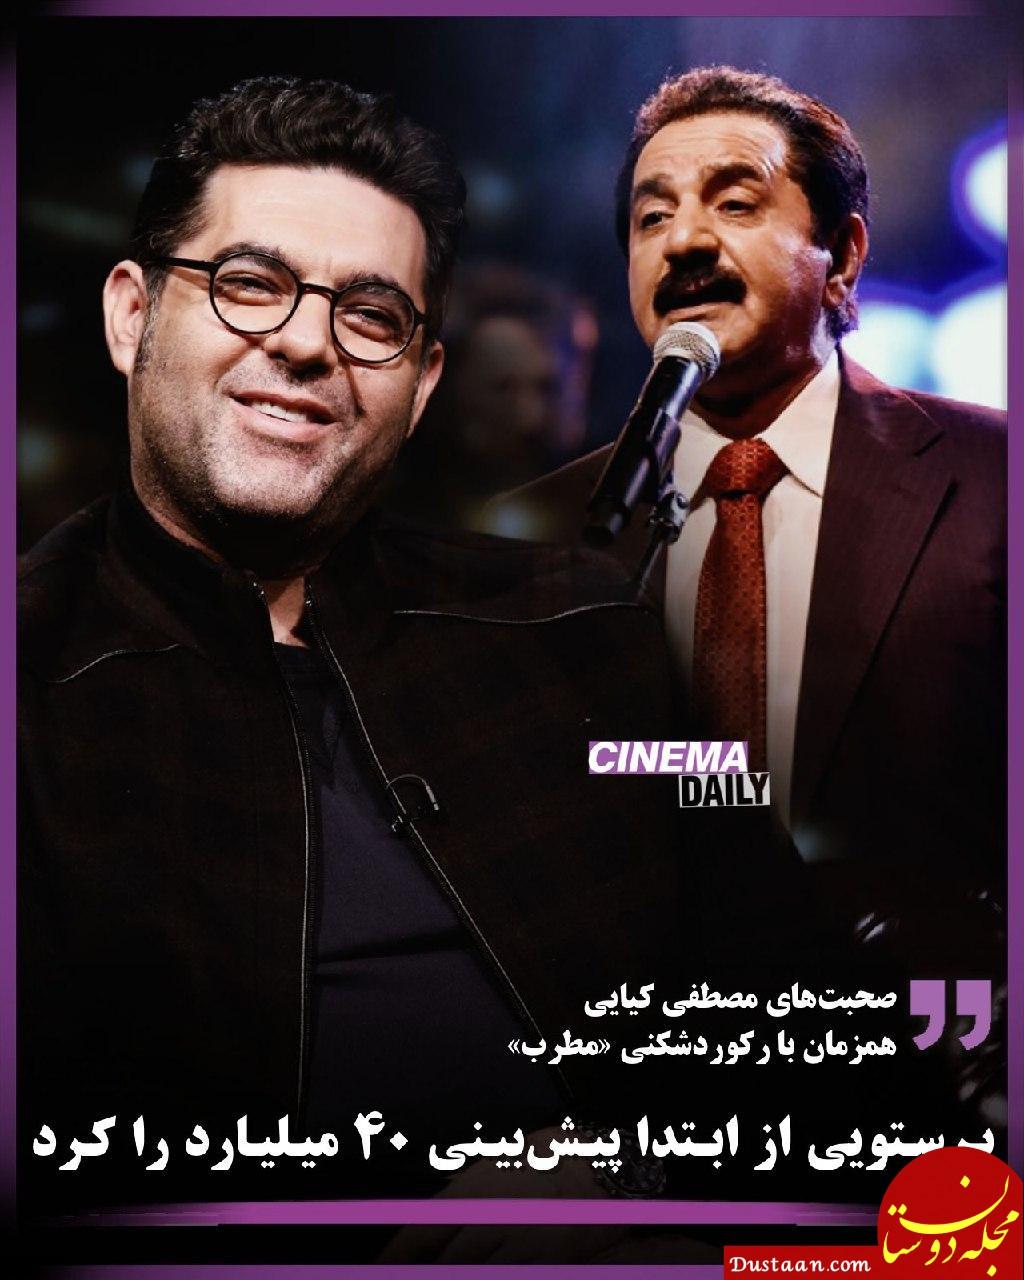 www.dustaan.com - مصطفی کیایی: تعمدا طوری فیلم می سازم که به جشنواره فجر نرسد!